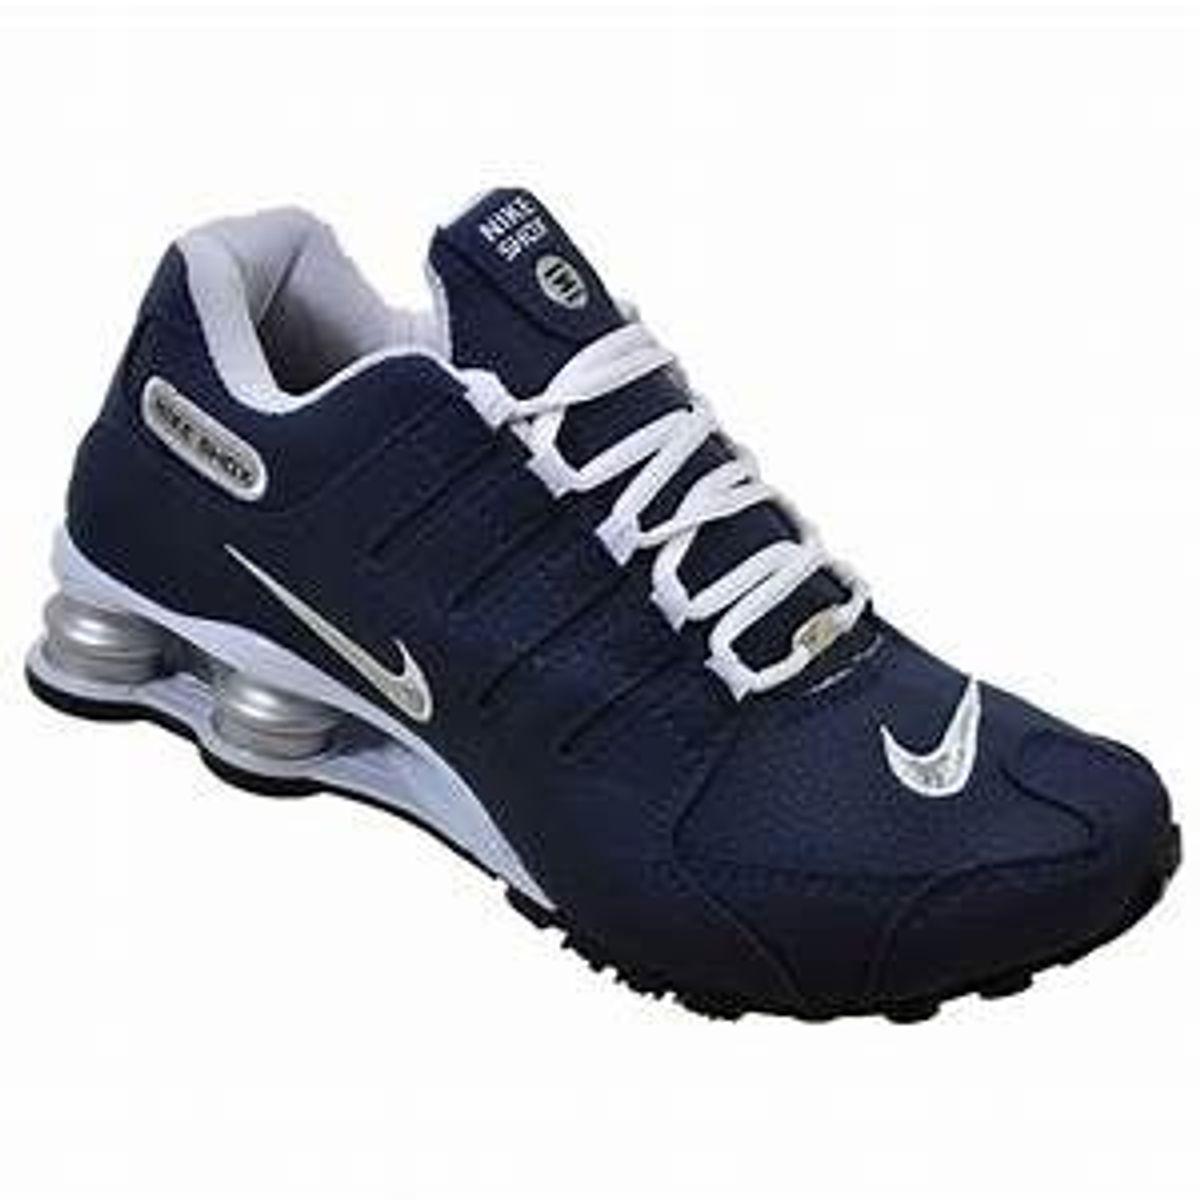 00222c4fdd9 Tenis Novo Nike Shox Nz Azul Numero 43